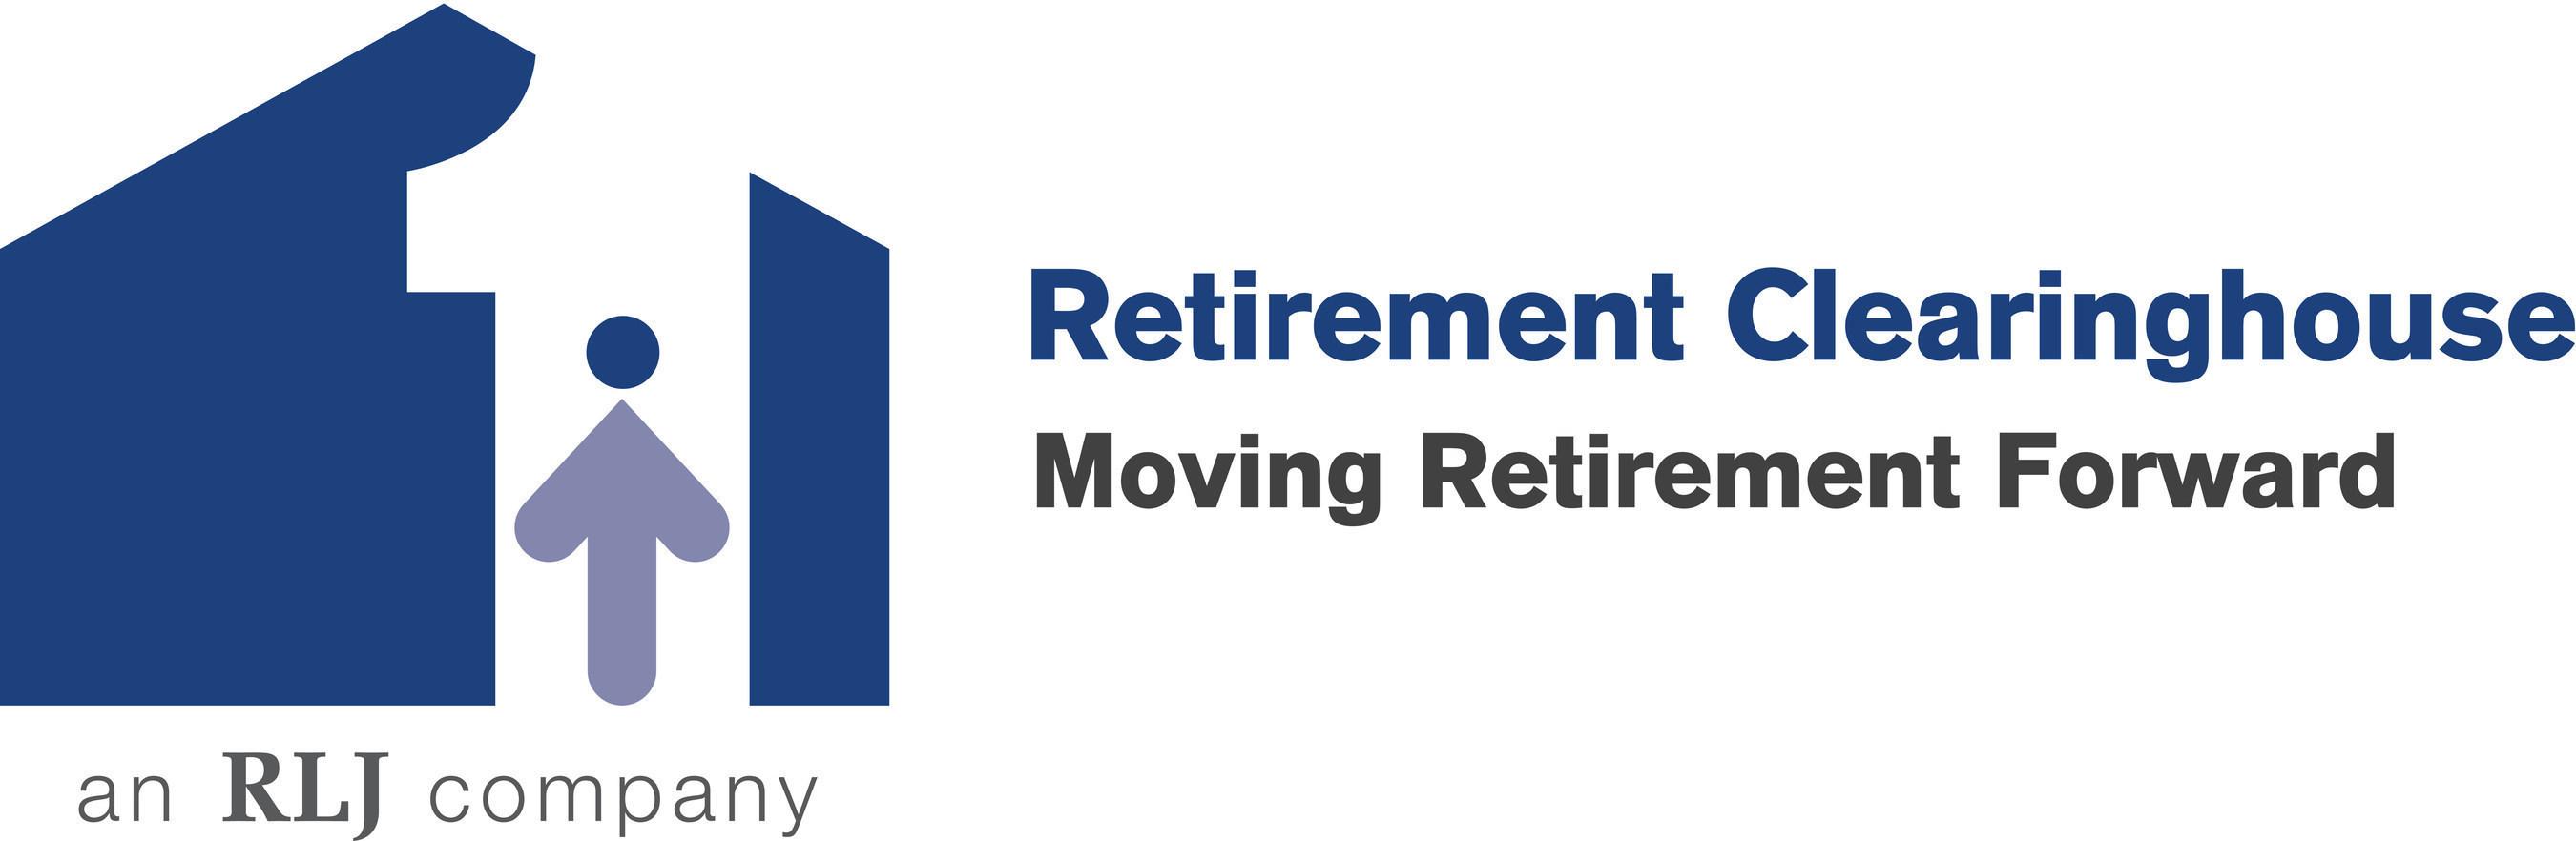 Retirement Clearinghouse, LLC Logo